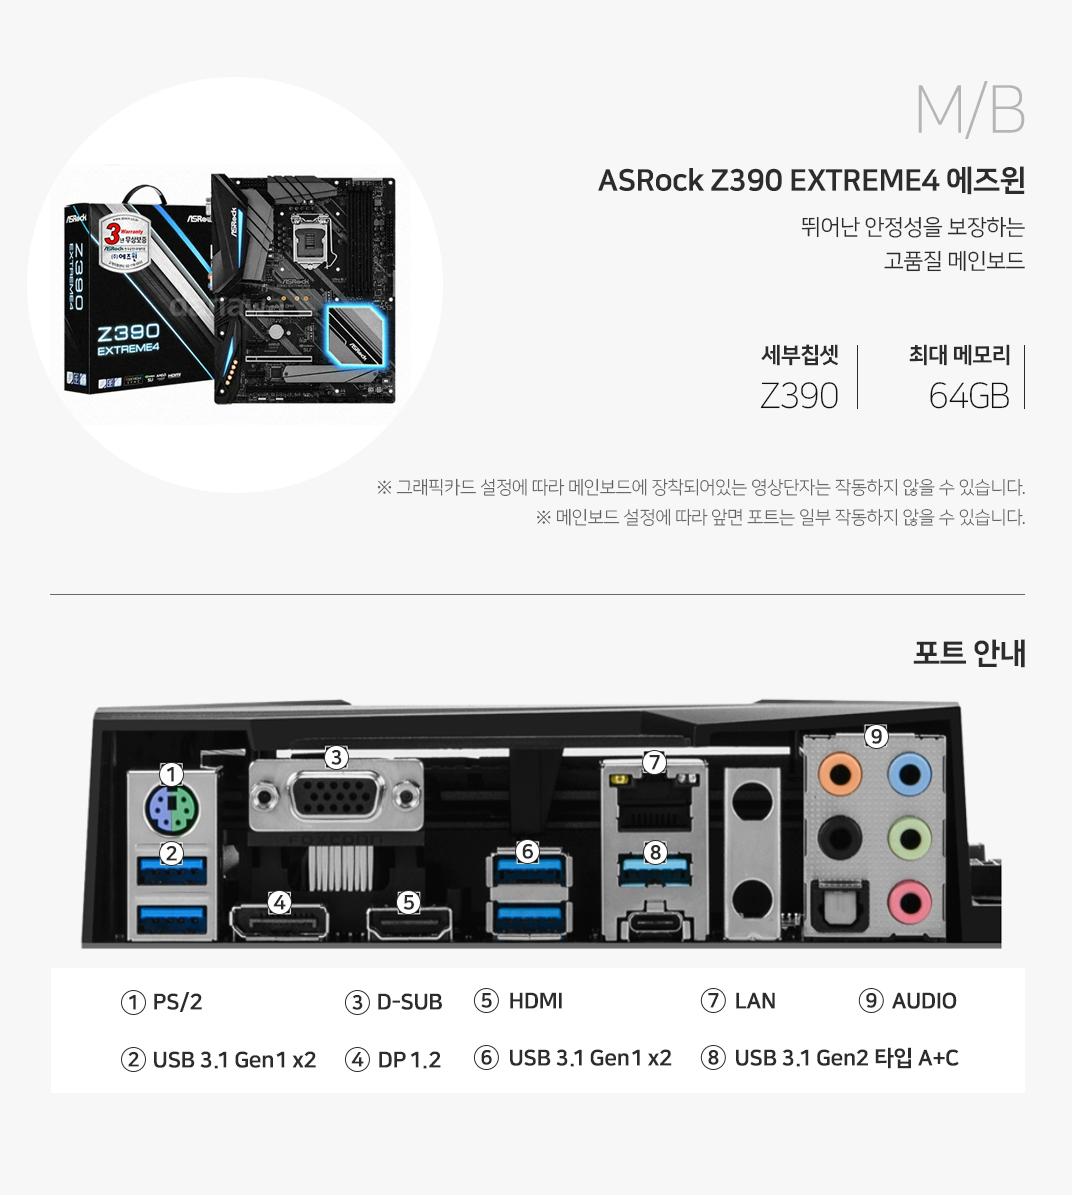 M/B ASRock Z390 EXTREME 4 에즈윈  뛰어난 안정성을 보장하는 고품질 메인보드 세부칩셋 Z390 최대메모리 64GB 그래픽 설정에 따라 메인보드에 장착되어 있는 영상단자는 작동하지 않을 수 있습니다. 메인보드 설정에 따라 앞면 포트는 일부 작동하지 않을 수 있습니다.